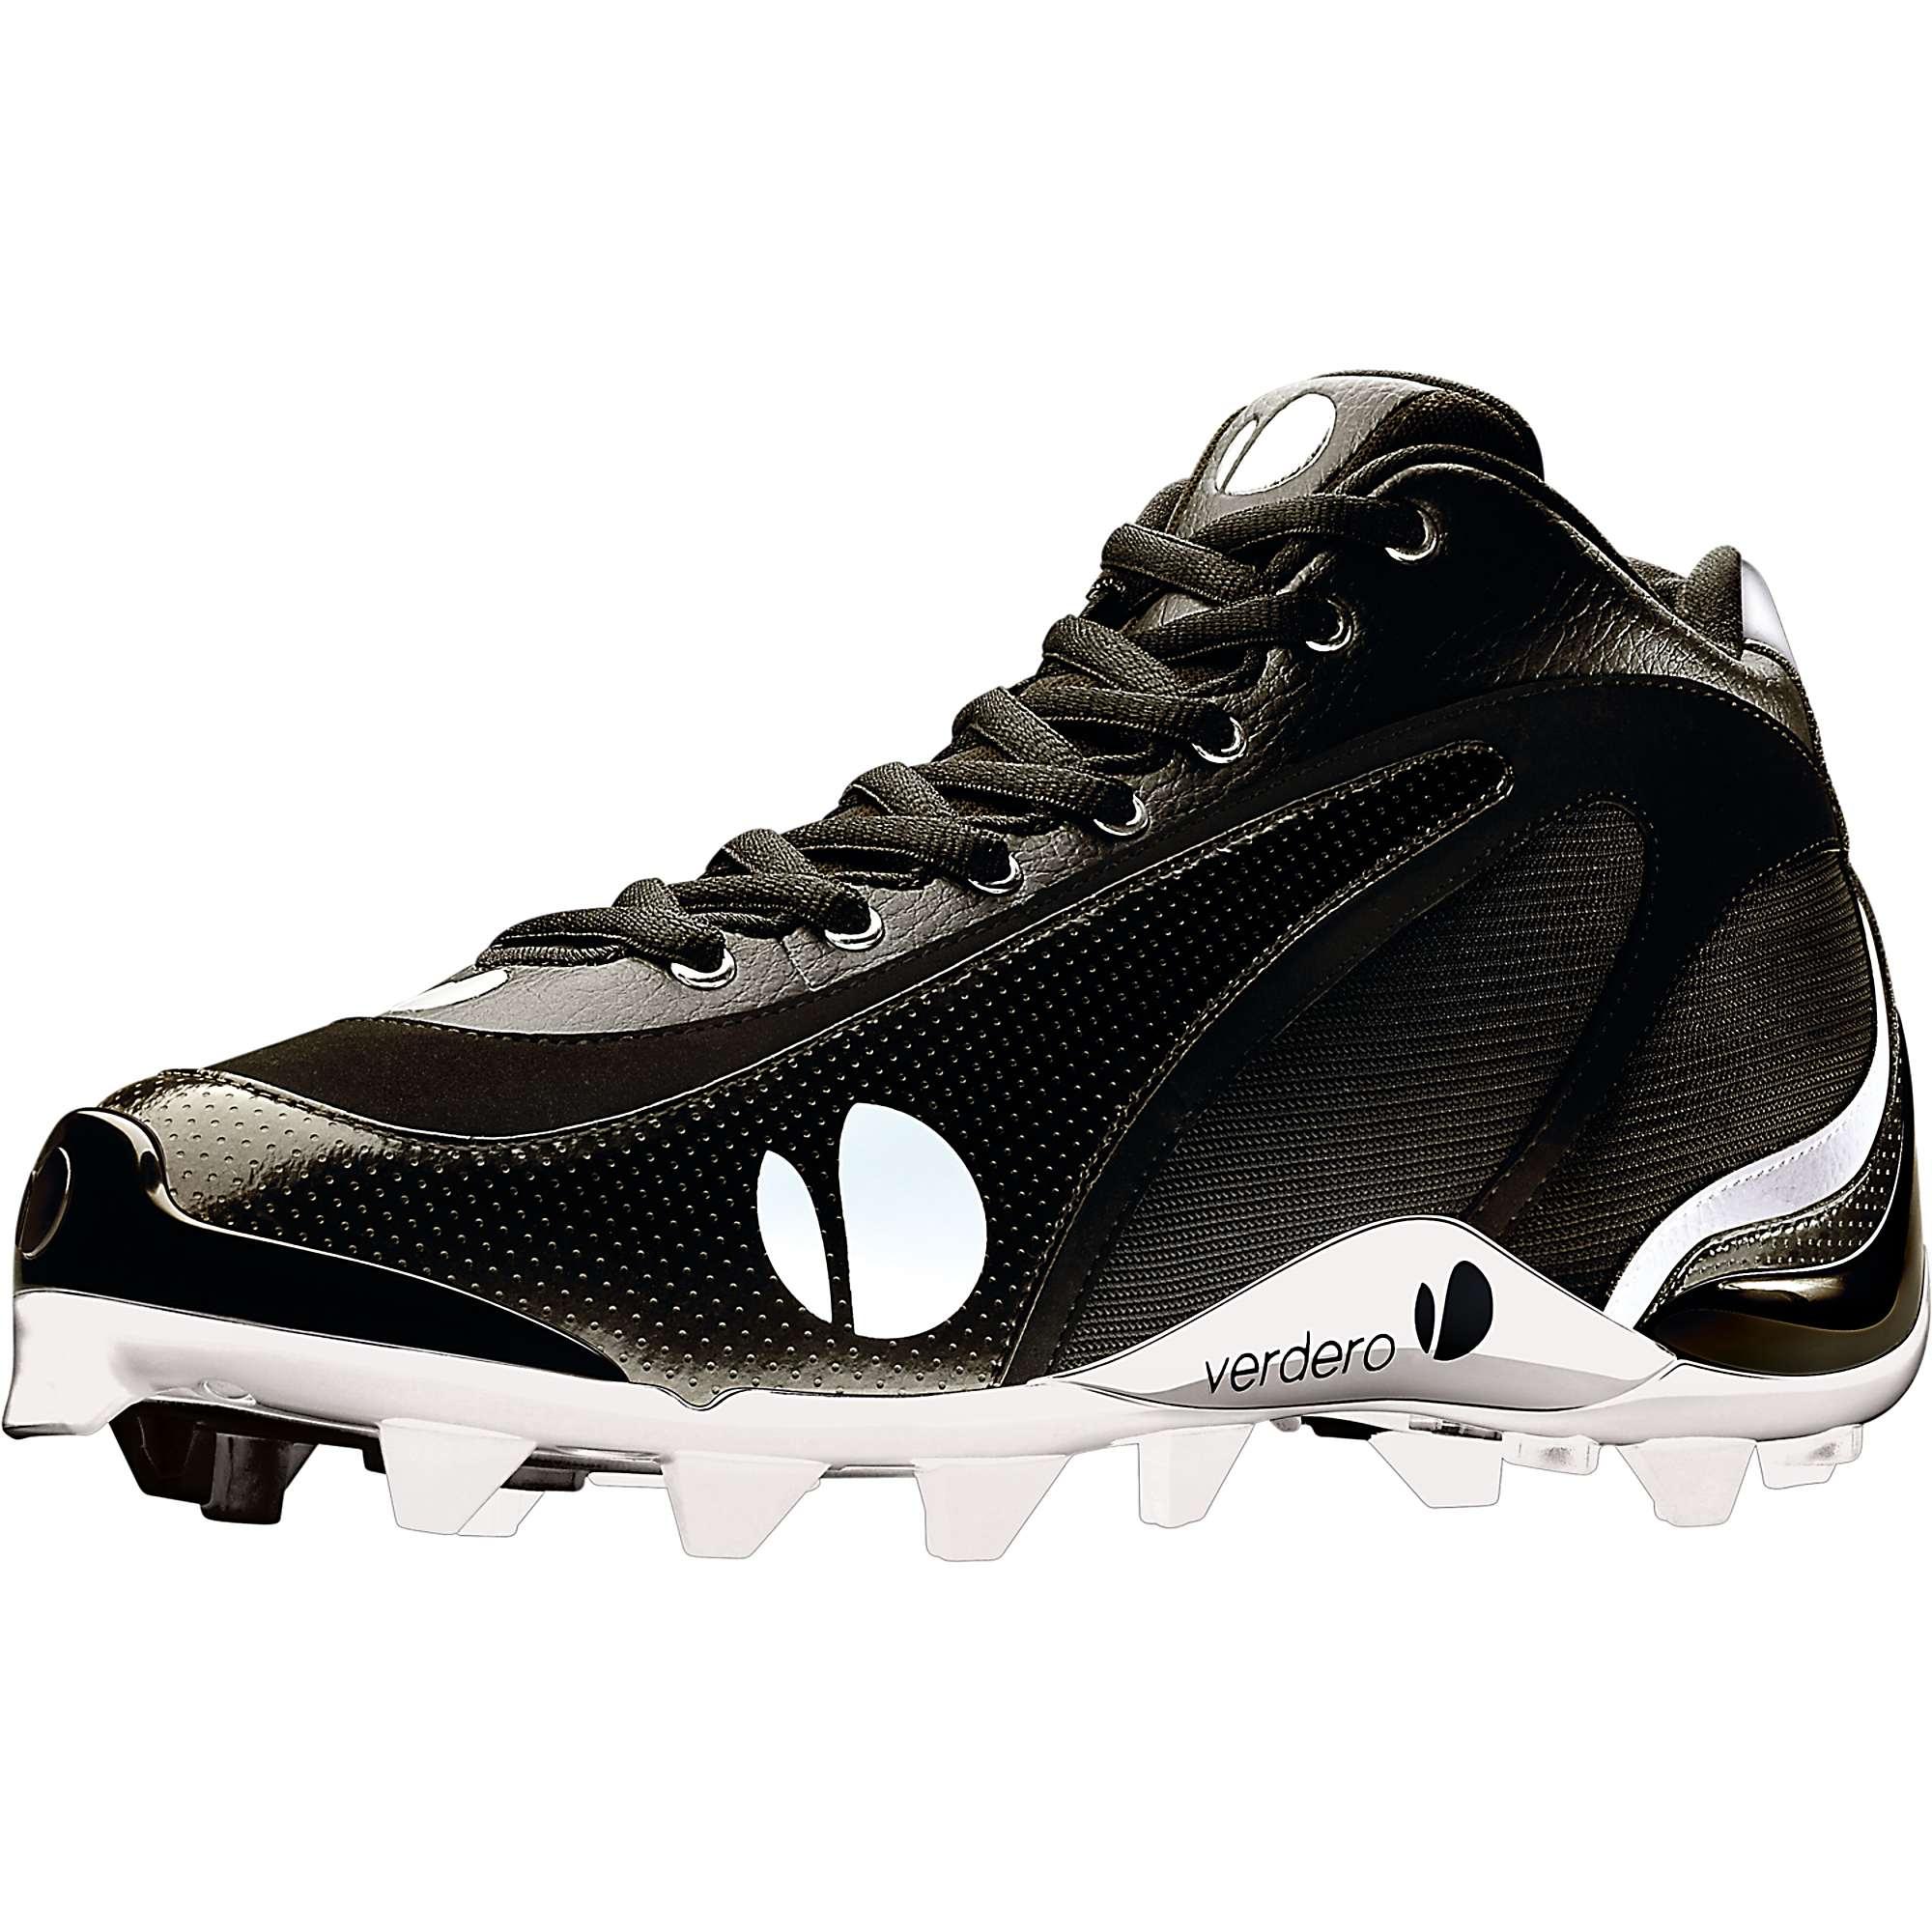 Verdero Men's Mid Molded Ii Baseball Cleats | eBay